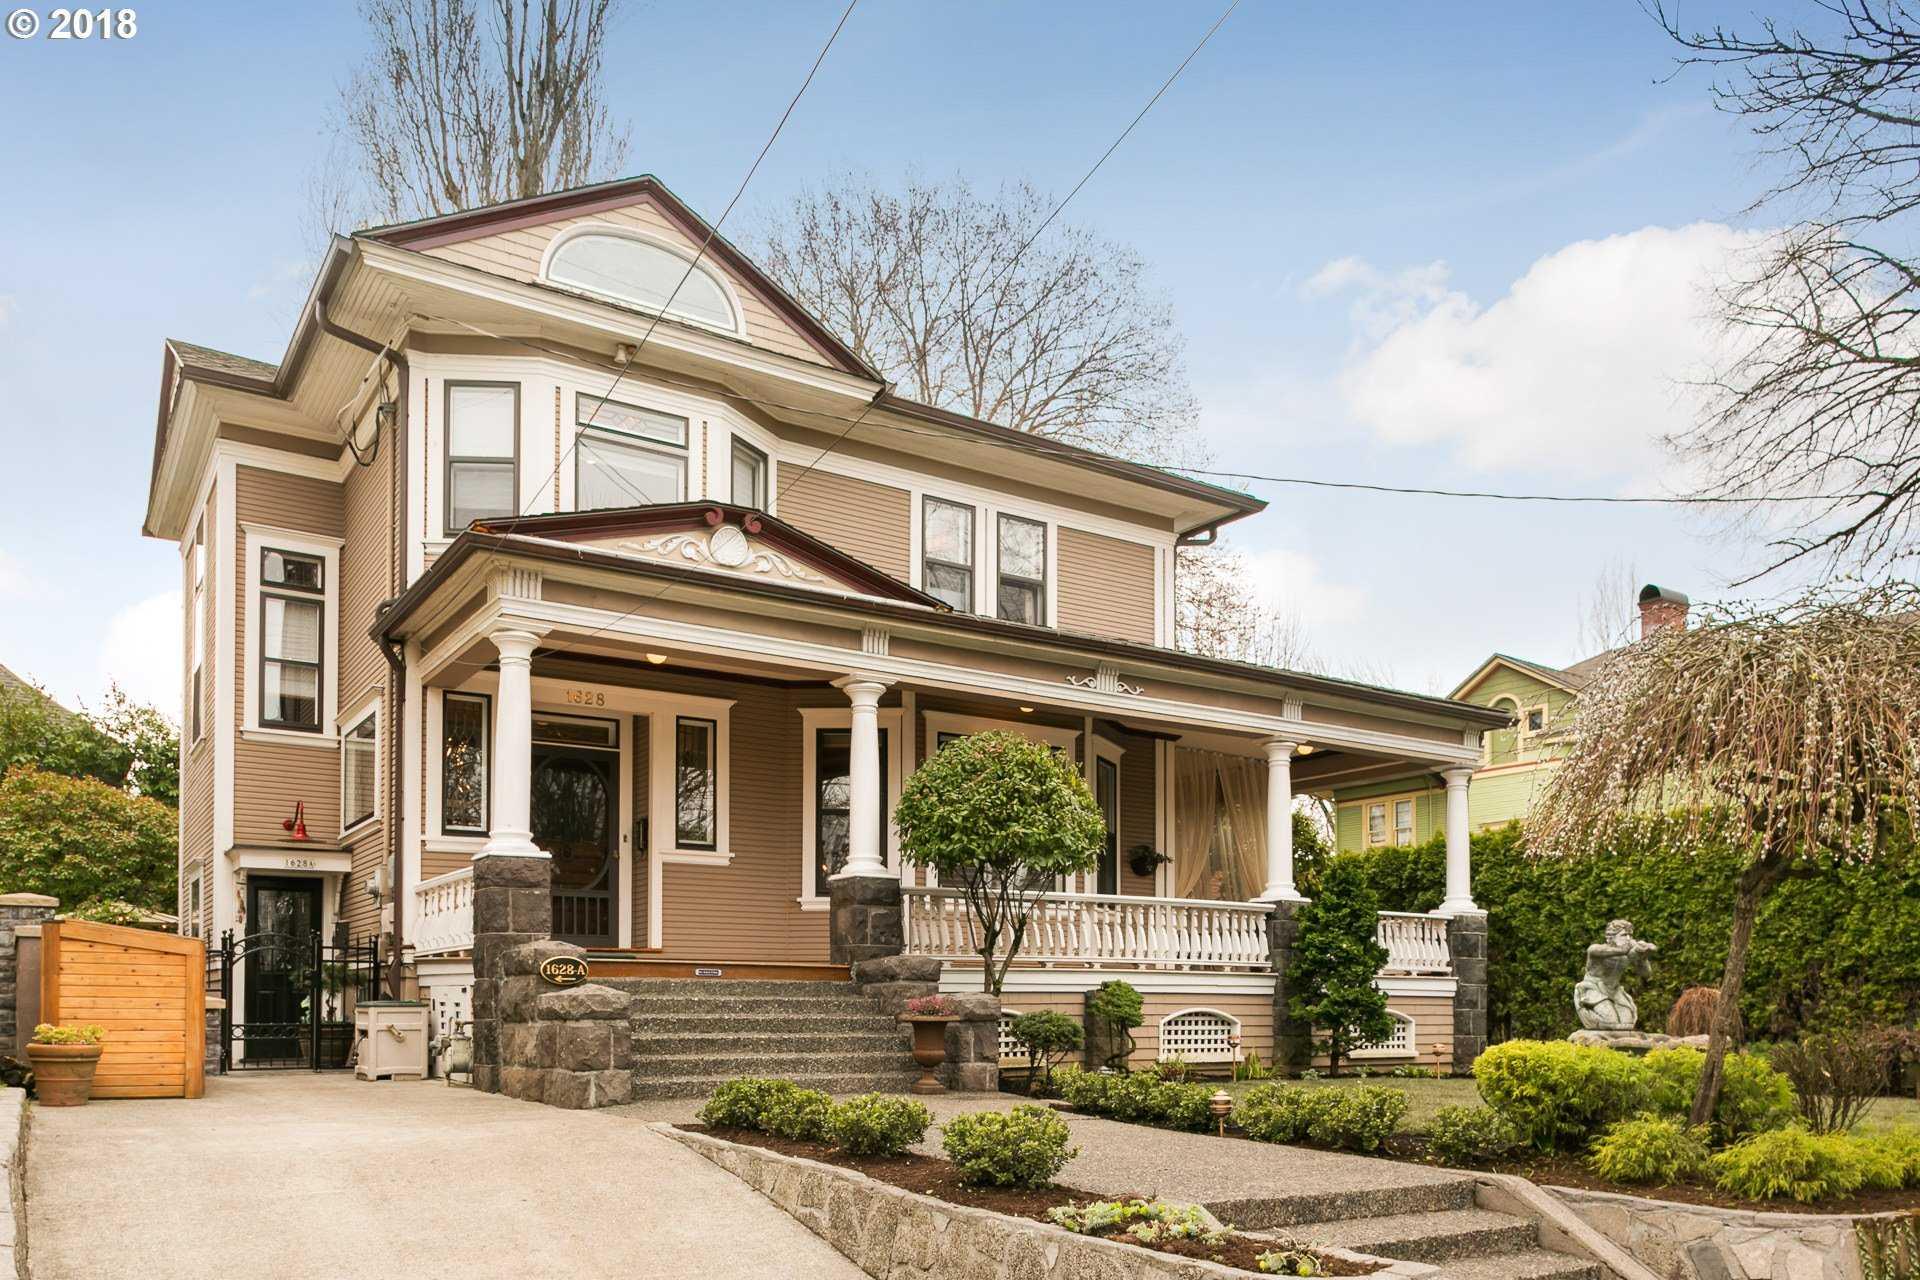 $1,099,900 - 4Br/3Ba -  for Sale in Buckman, Portland